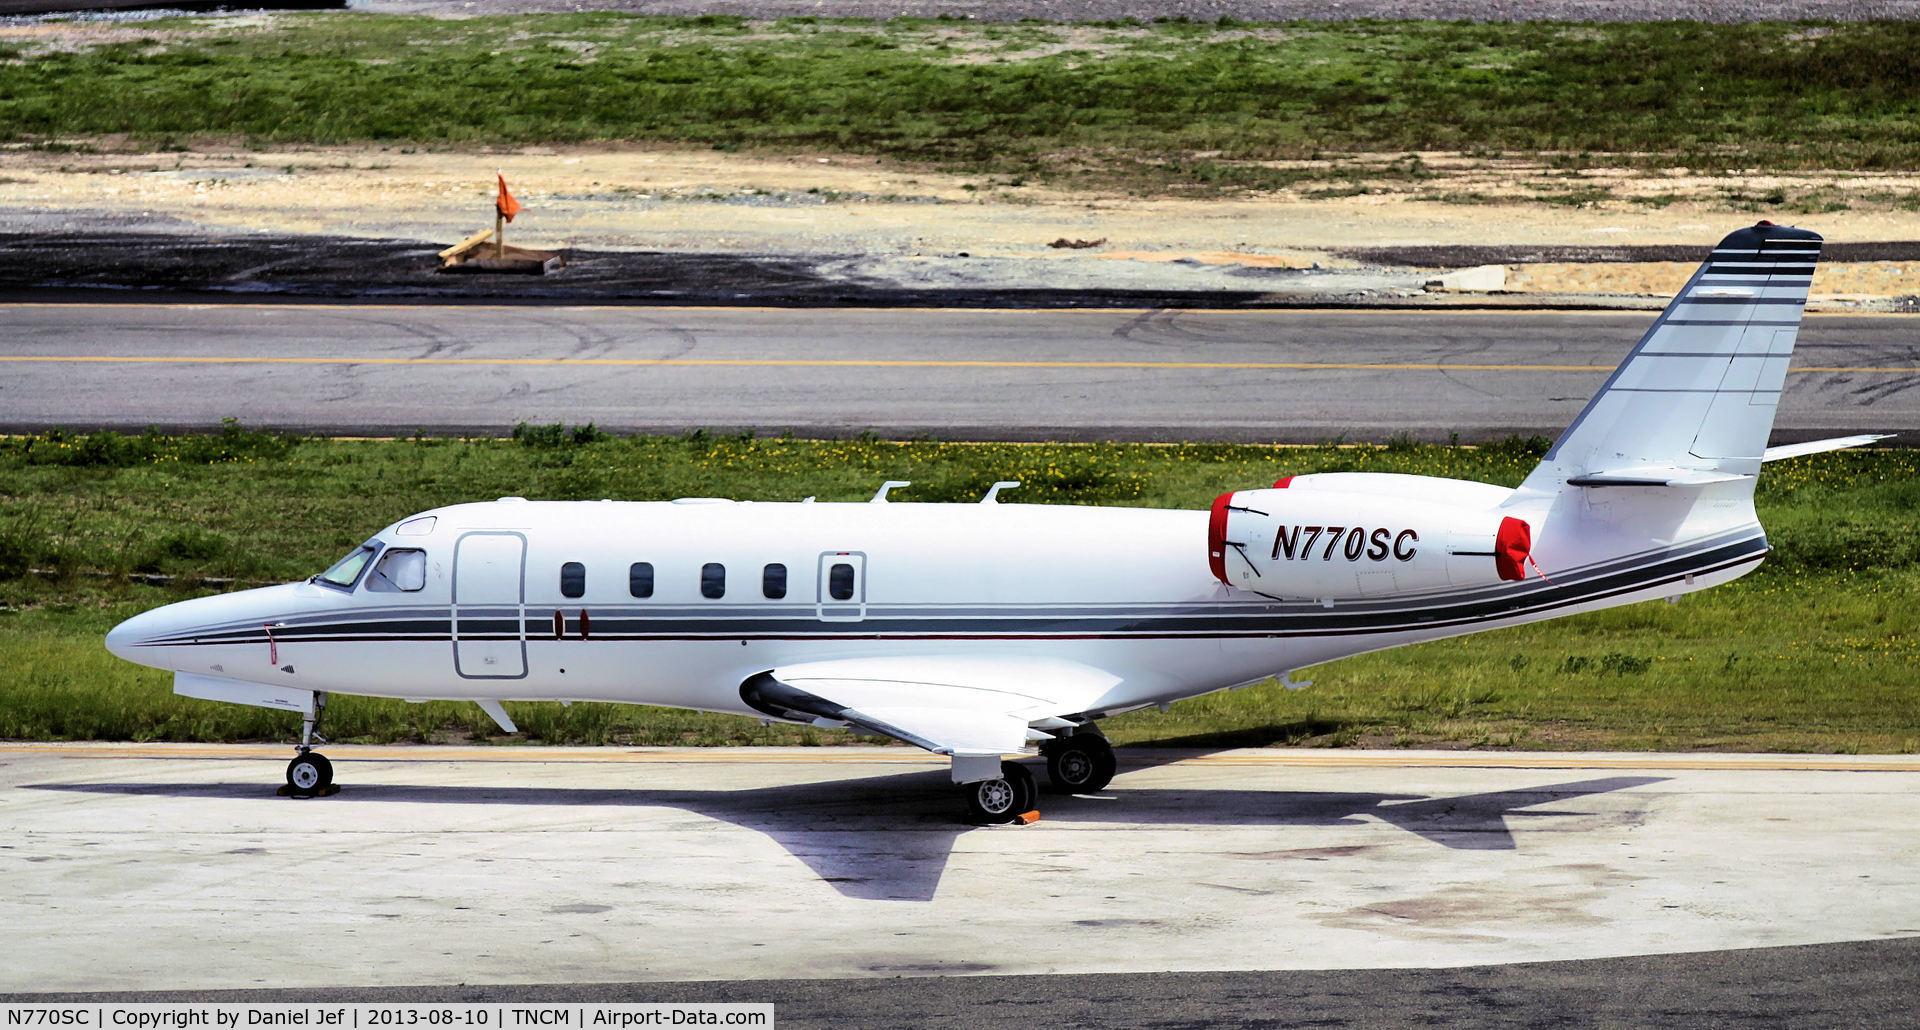 N770SC, 1991 Israel Aircraft Industries IAI-1125 Westwind Astra C/N 054, N770SC